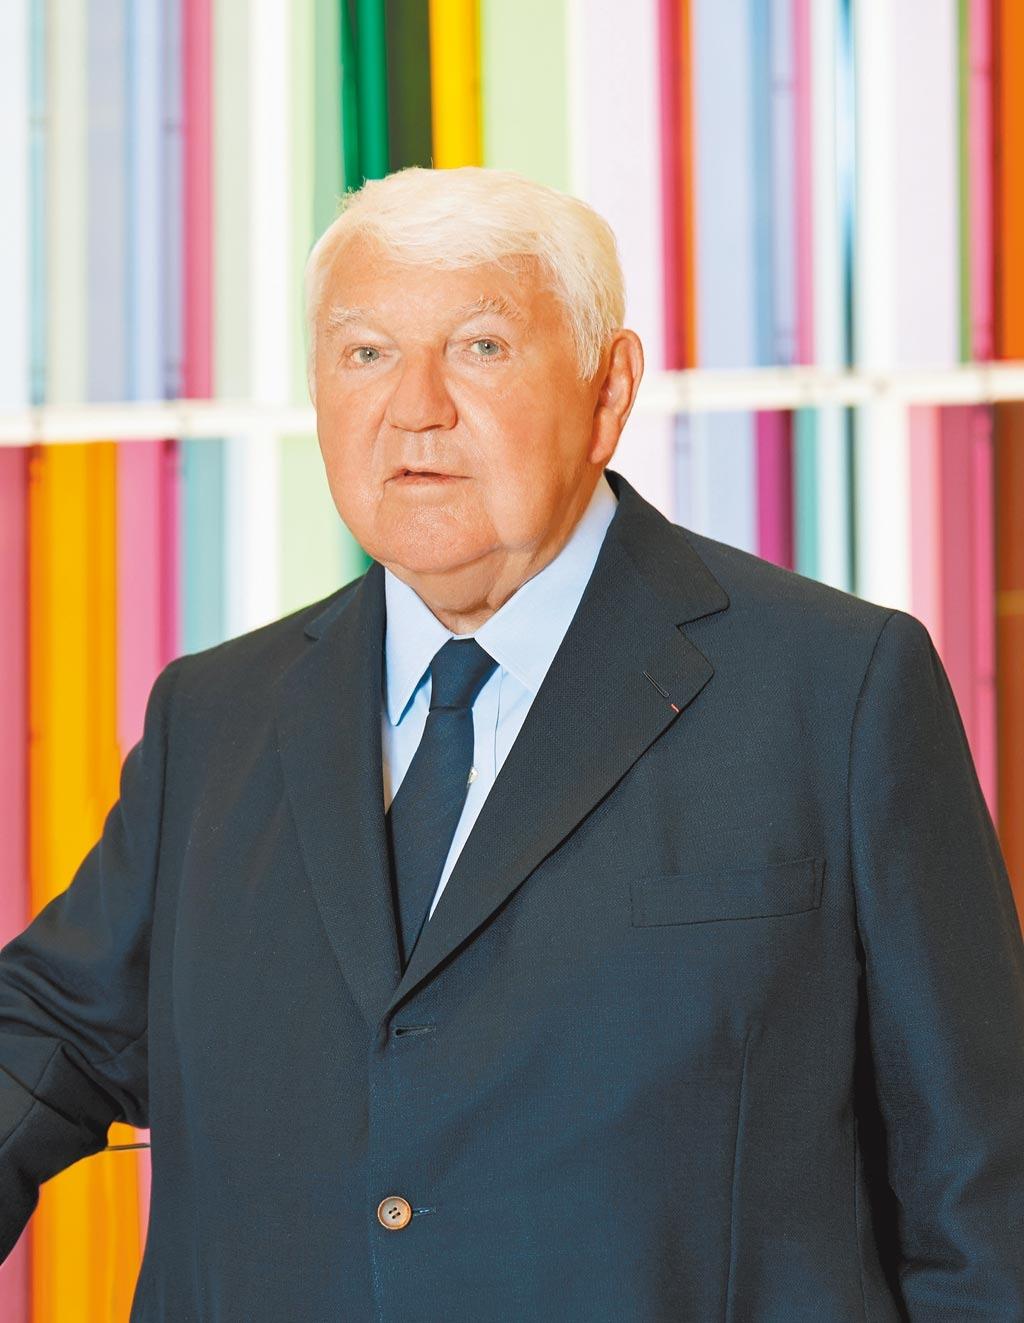 Longchamp總裁菲力卡仕格蘭染疫過世,他開創風靡全球的Le Pliage經典摺疊包,深具時尚影響力。(Longchamp提供)